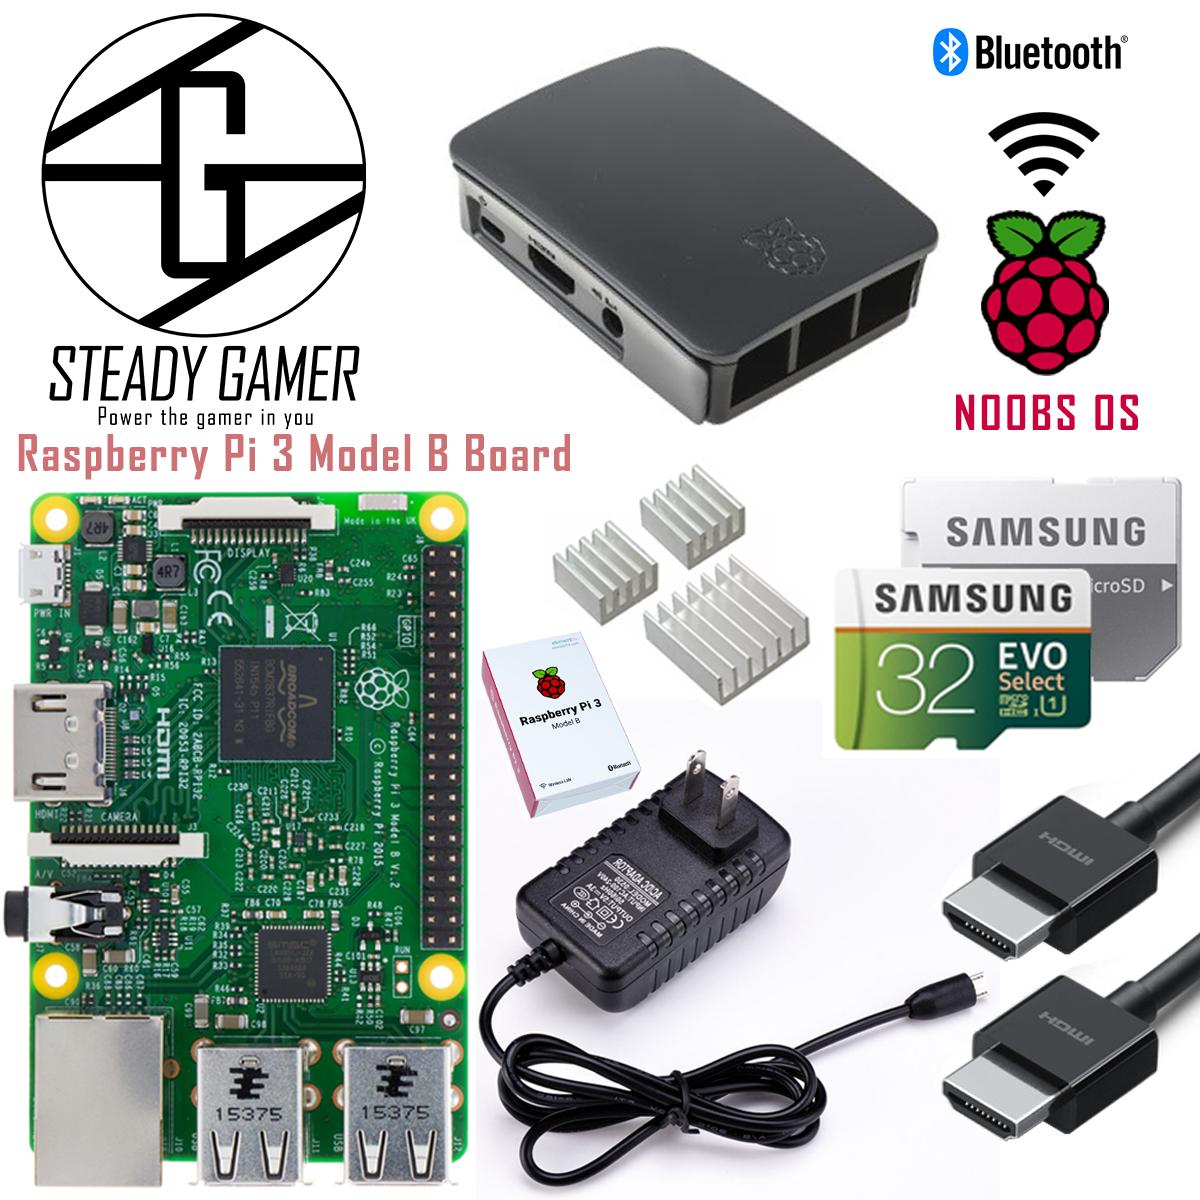 Starter Kit Raspberry Pi 3 B - 32GB - Free Shipping - Steady Gamer